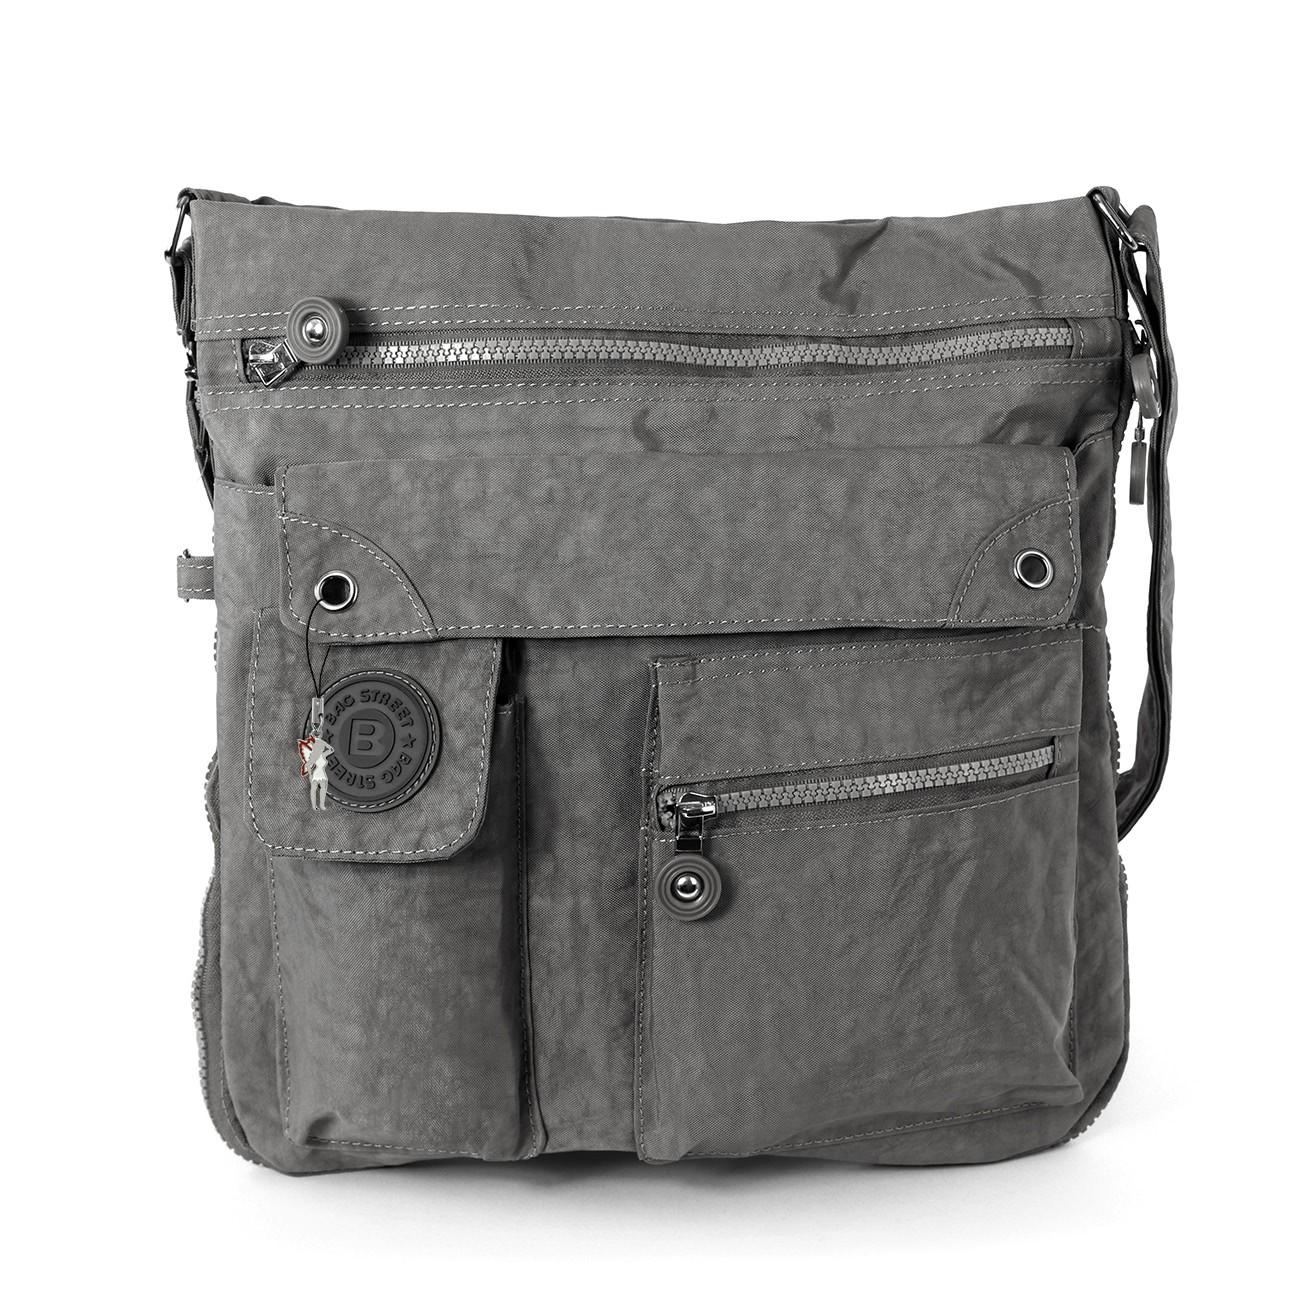 Umhängetasche Nylon grau Cross-Body Schultertasche Bag Street OTJ206K